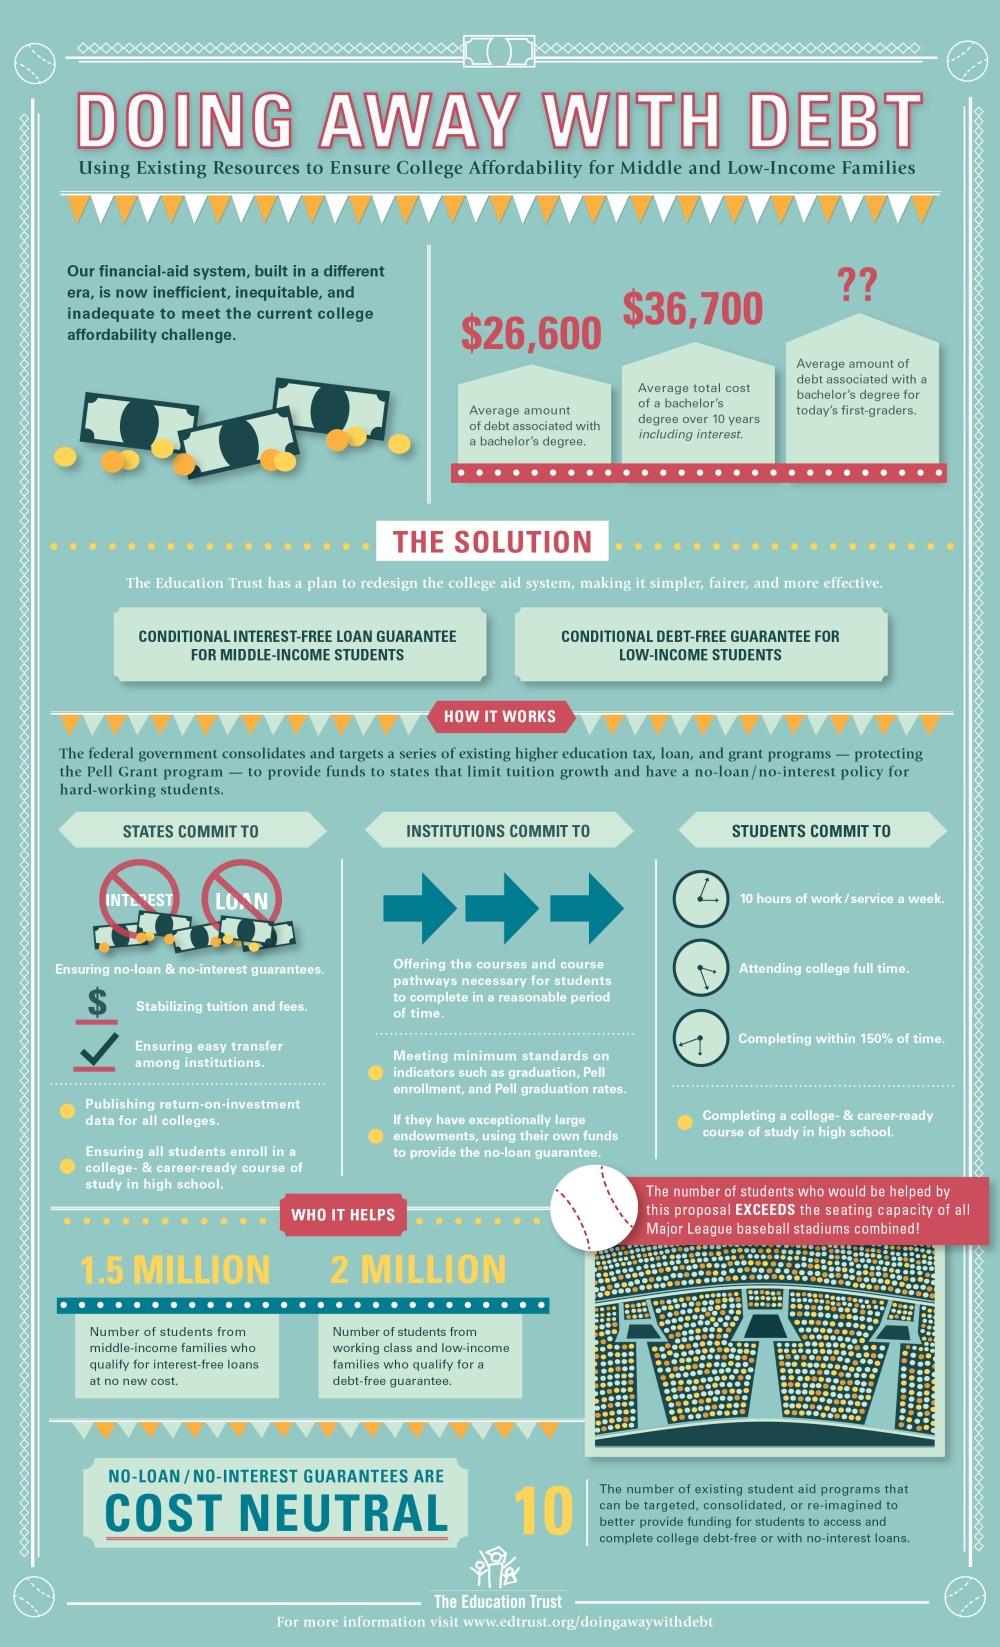 HE-116_DoingAwayWithDebt_Infographic_page1